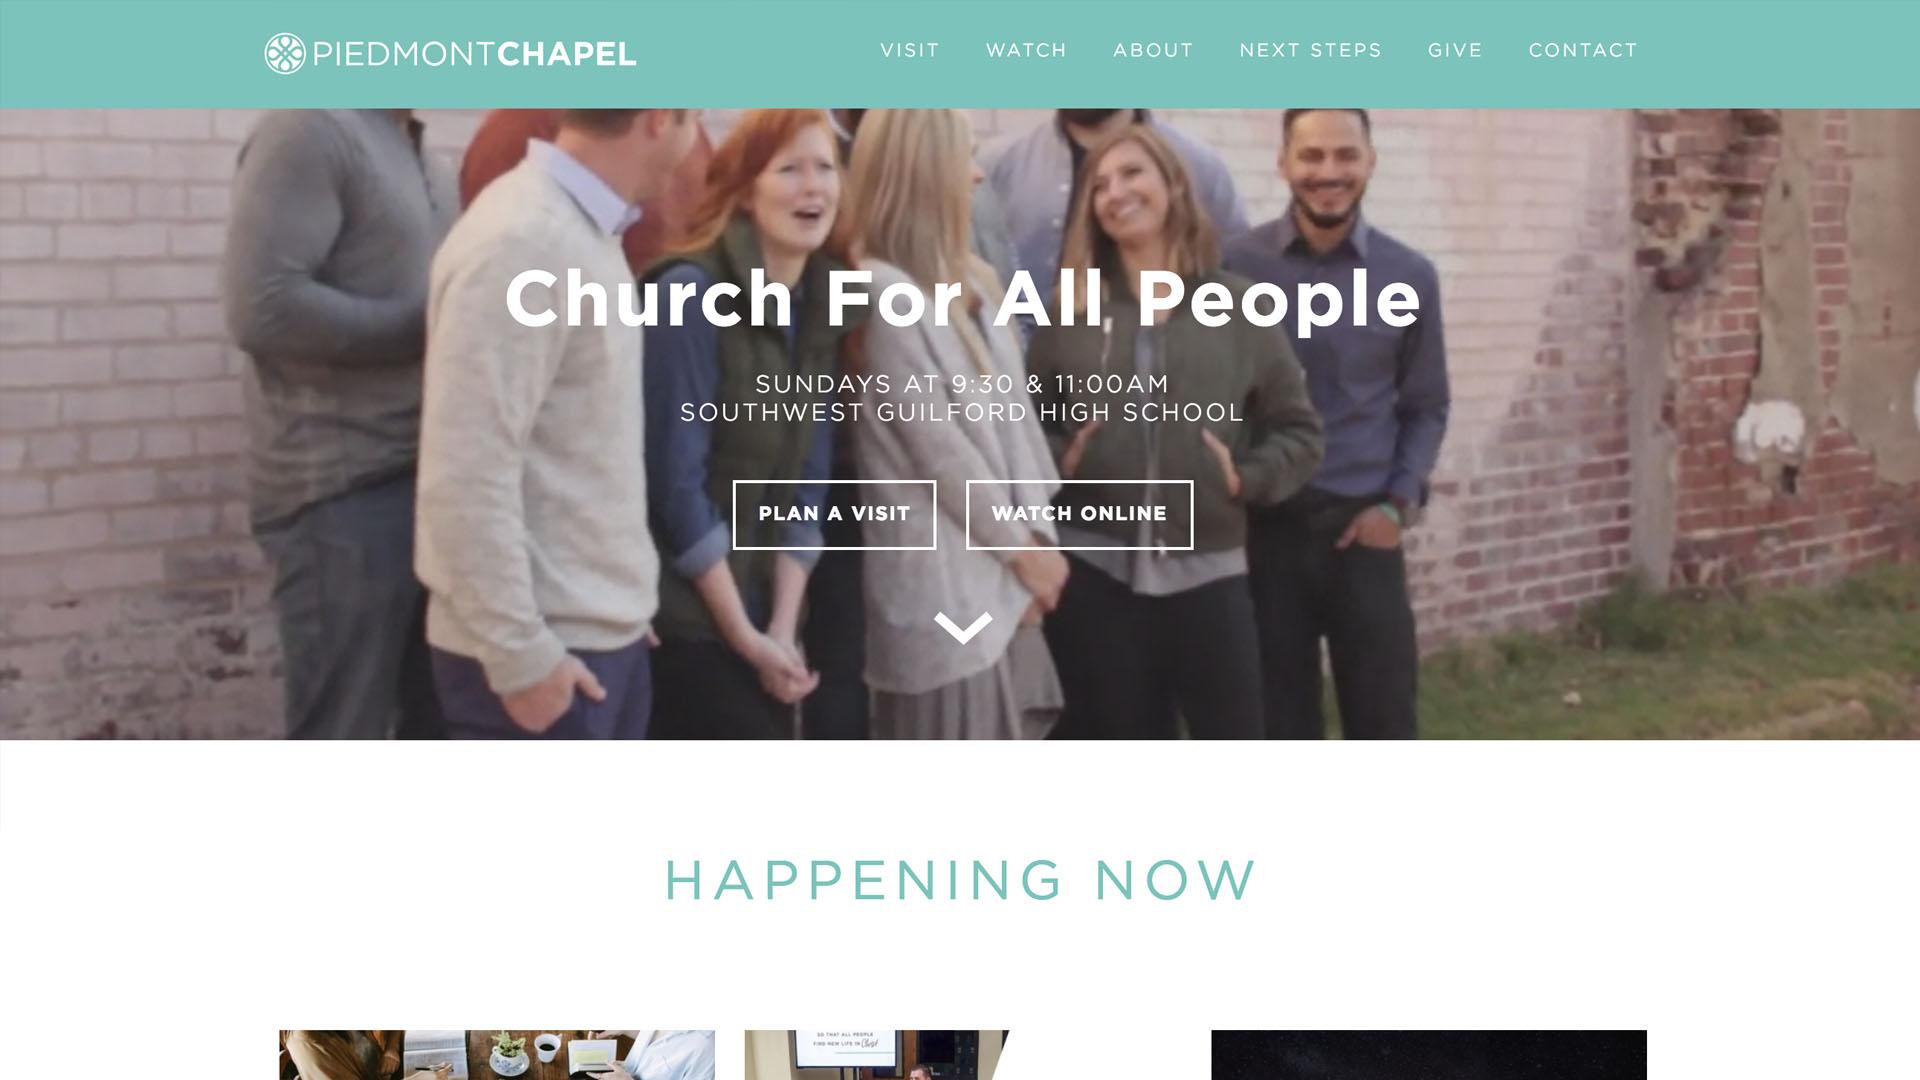 Piedmont Chapel - https://www.piedmontchapel.com/